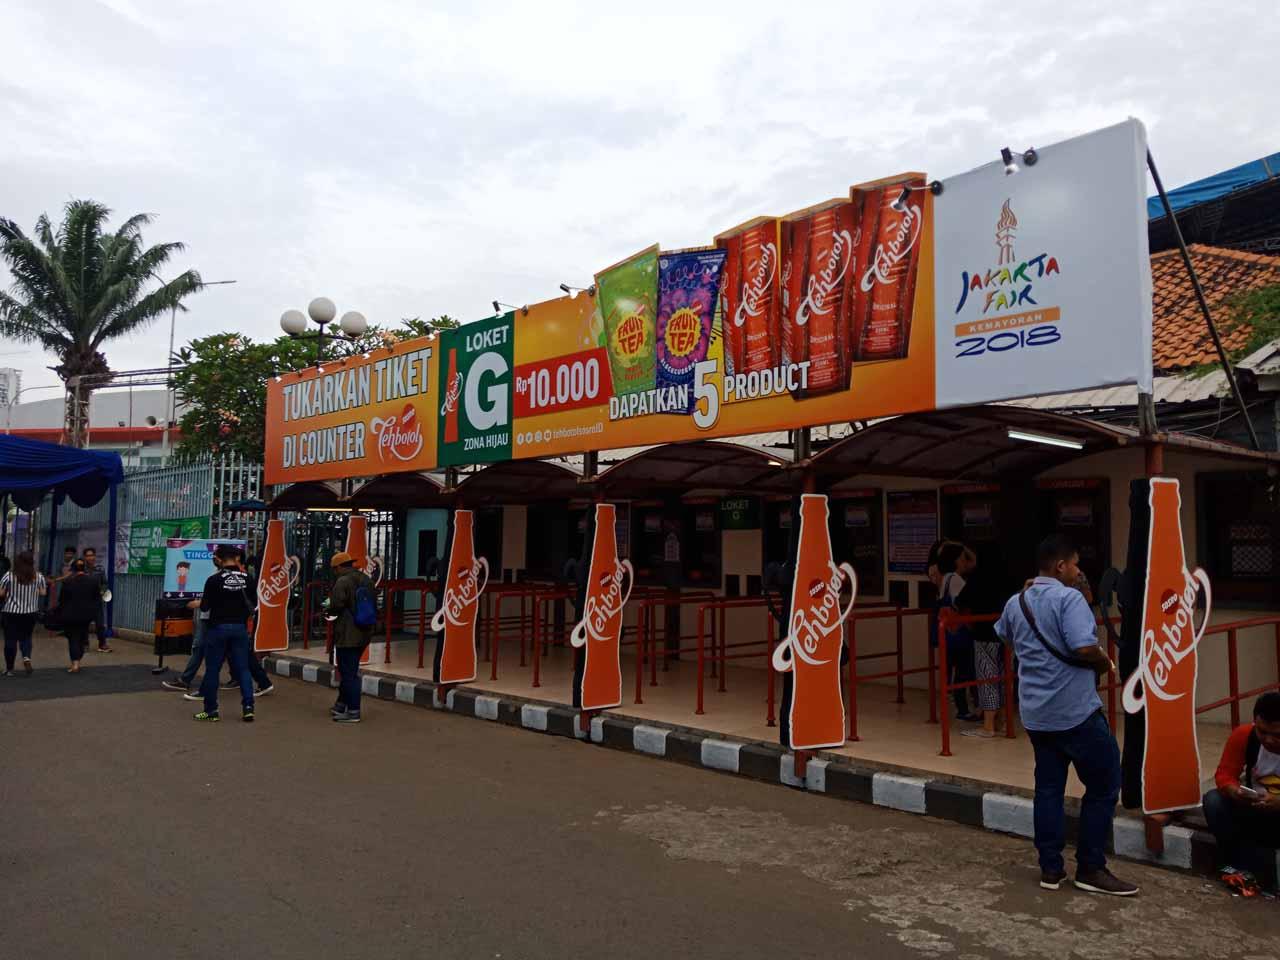 Loket G Jakarta Fair Kemayoran 2018 (JFK 2018) - Yopie Pangkey - 1